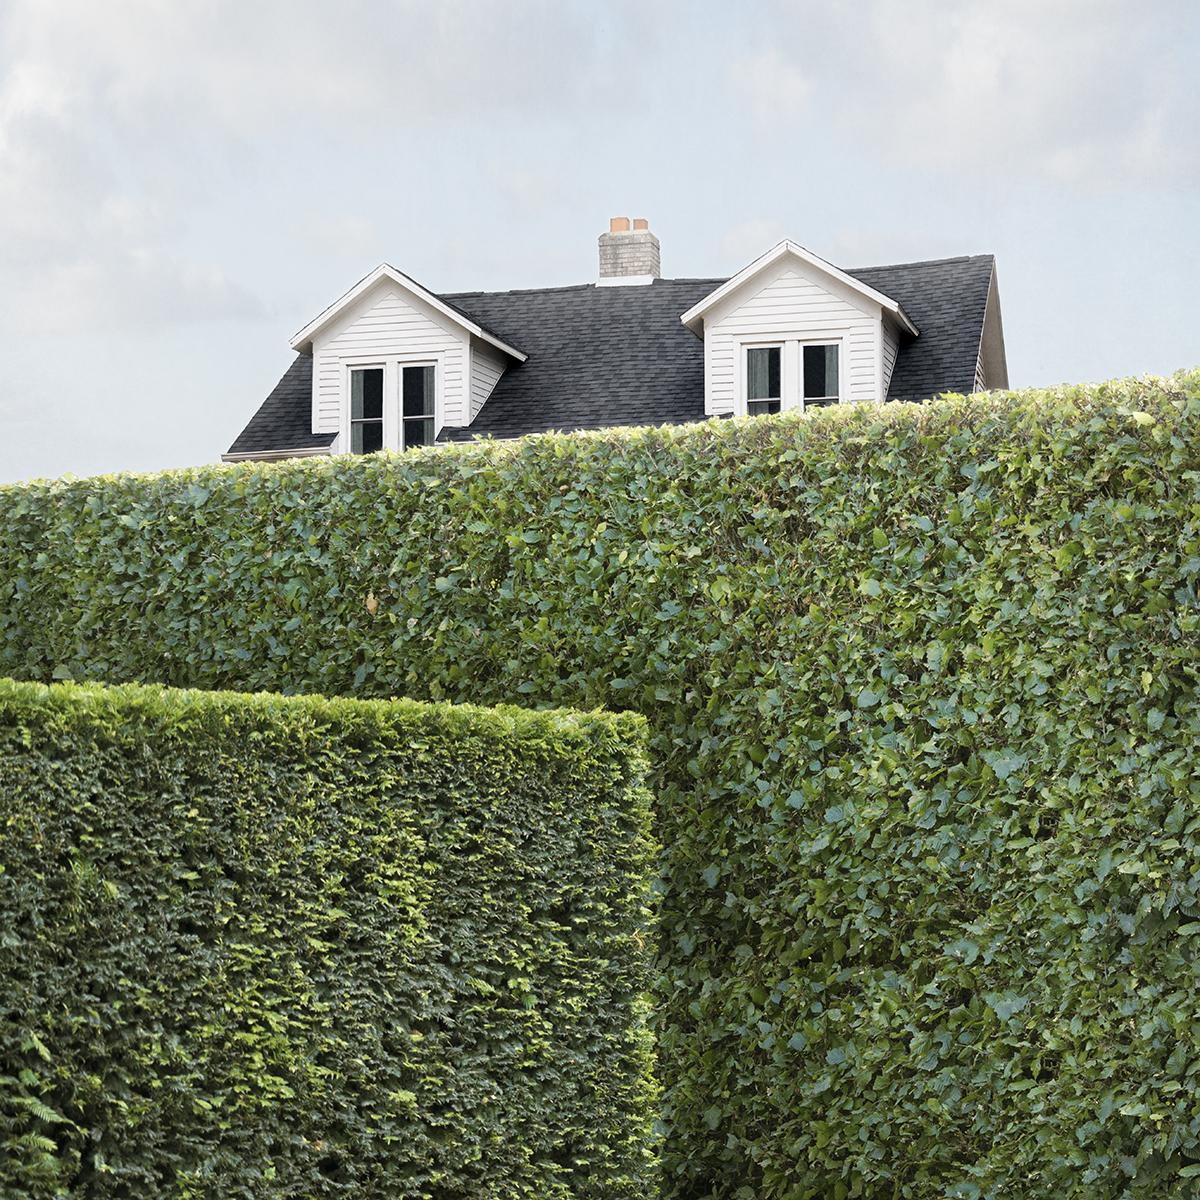 House & Hedge  by Carol Erb